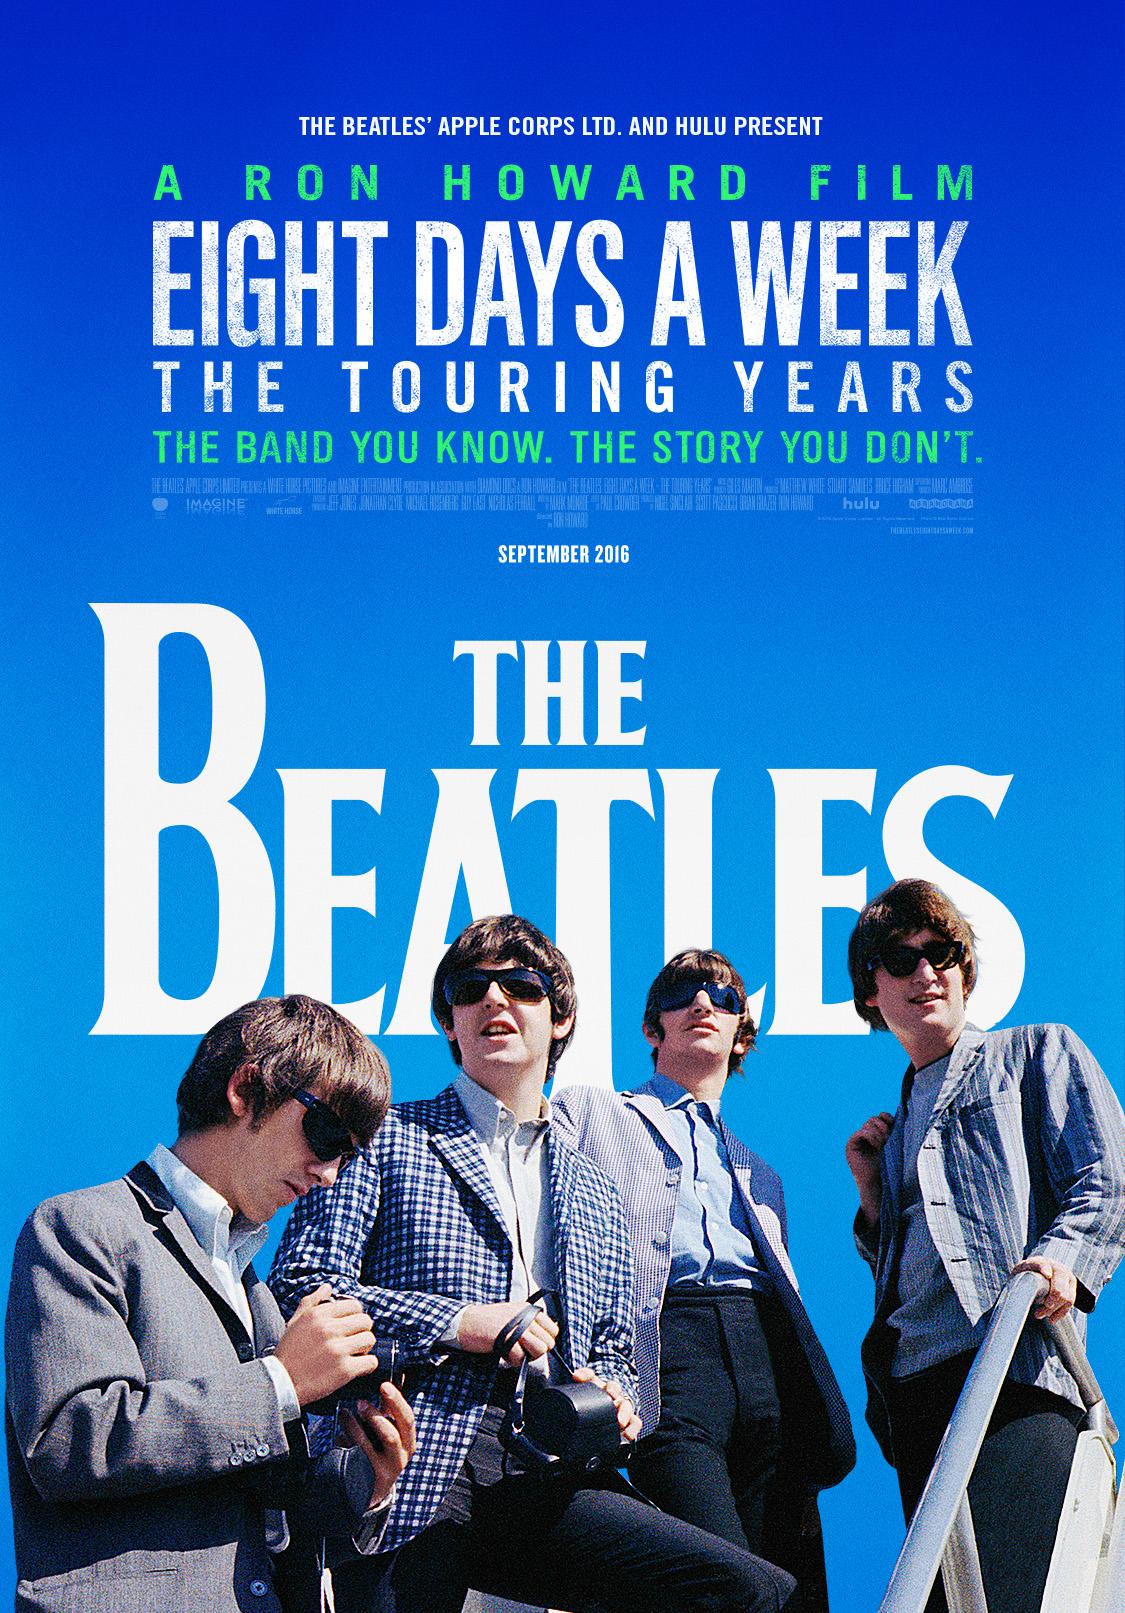 The Beatles - Eight Days A Week - poster.jpg